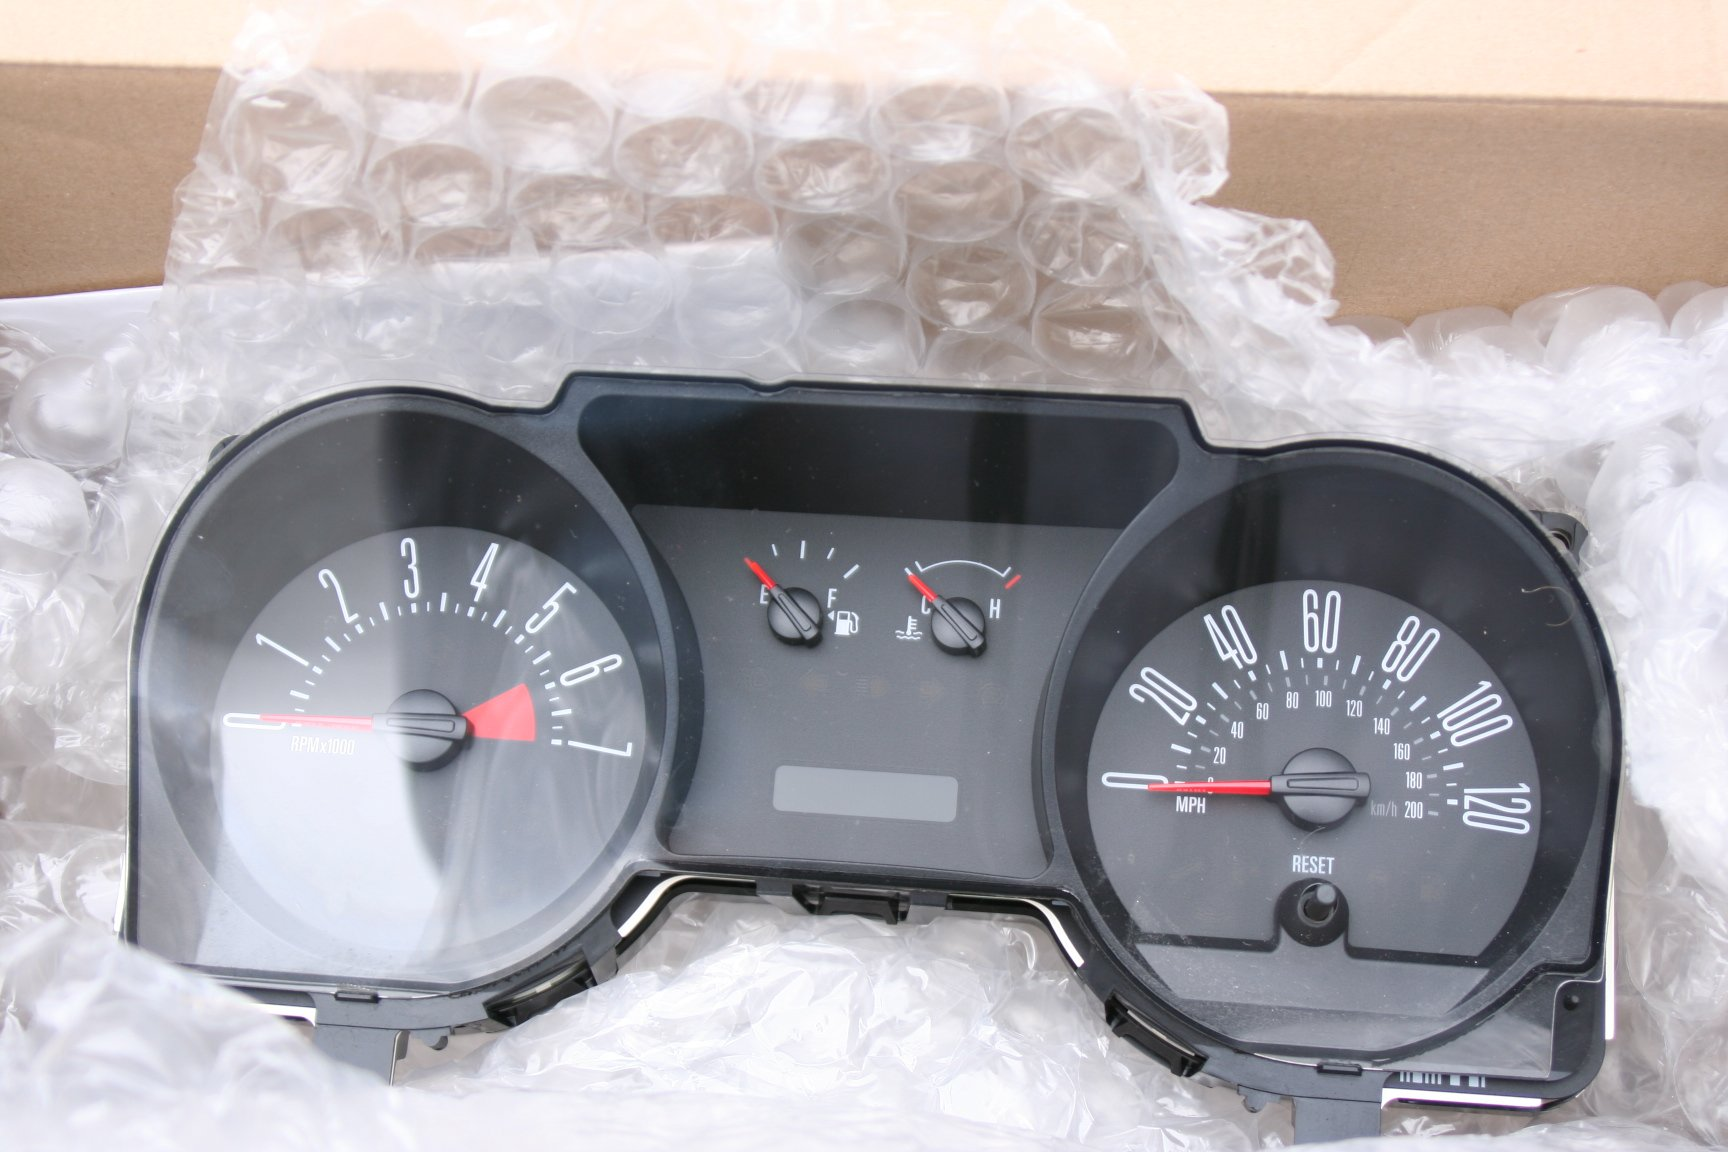 2005 ford mustang gt gauge cluster